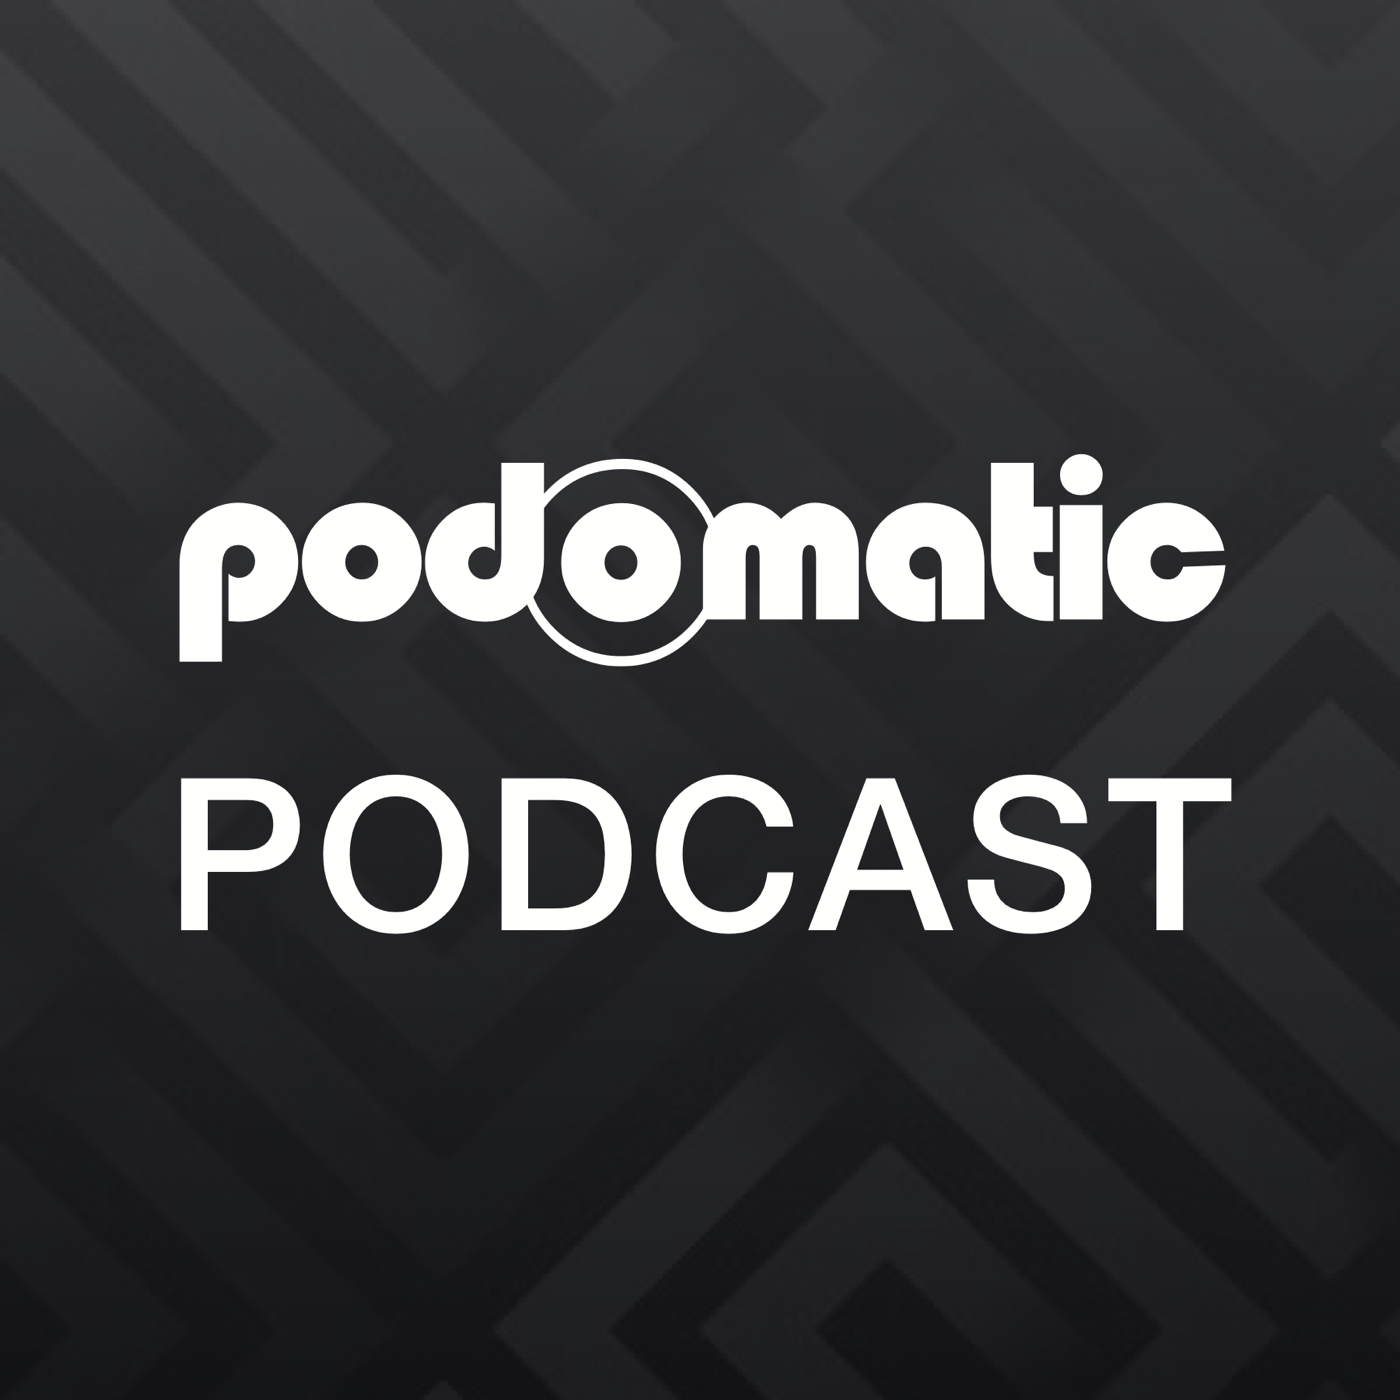 alawi120's Podcast